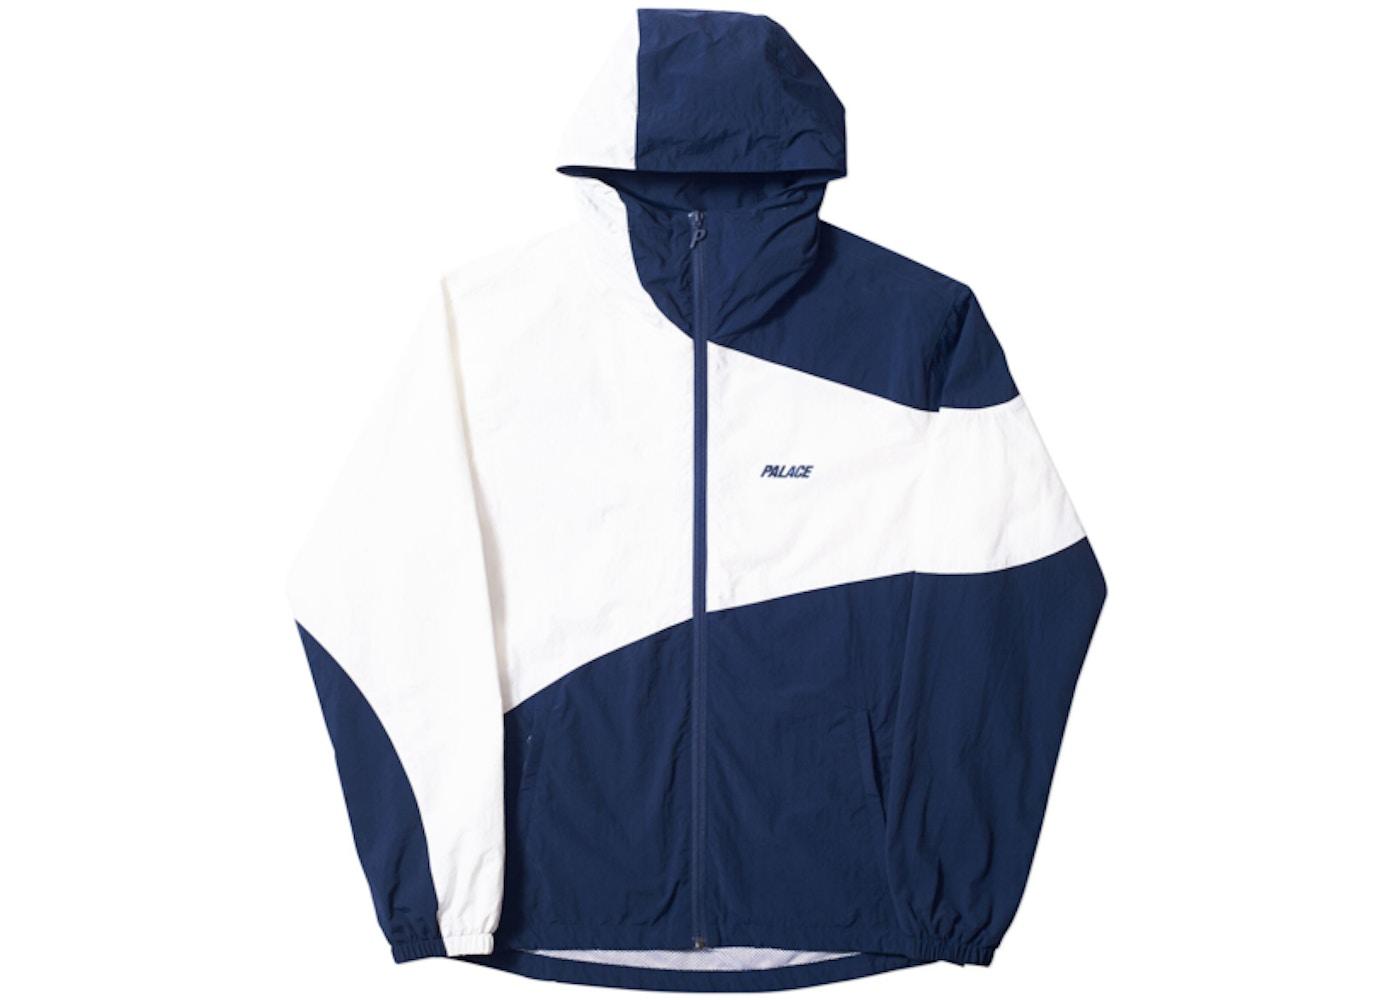 8f8c7d69ec45 Streetwear - Palace Tops Sweatshirts - Last Sale